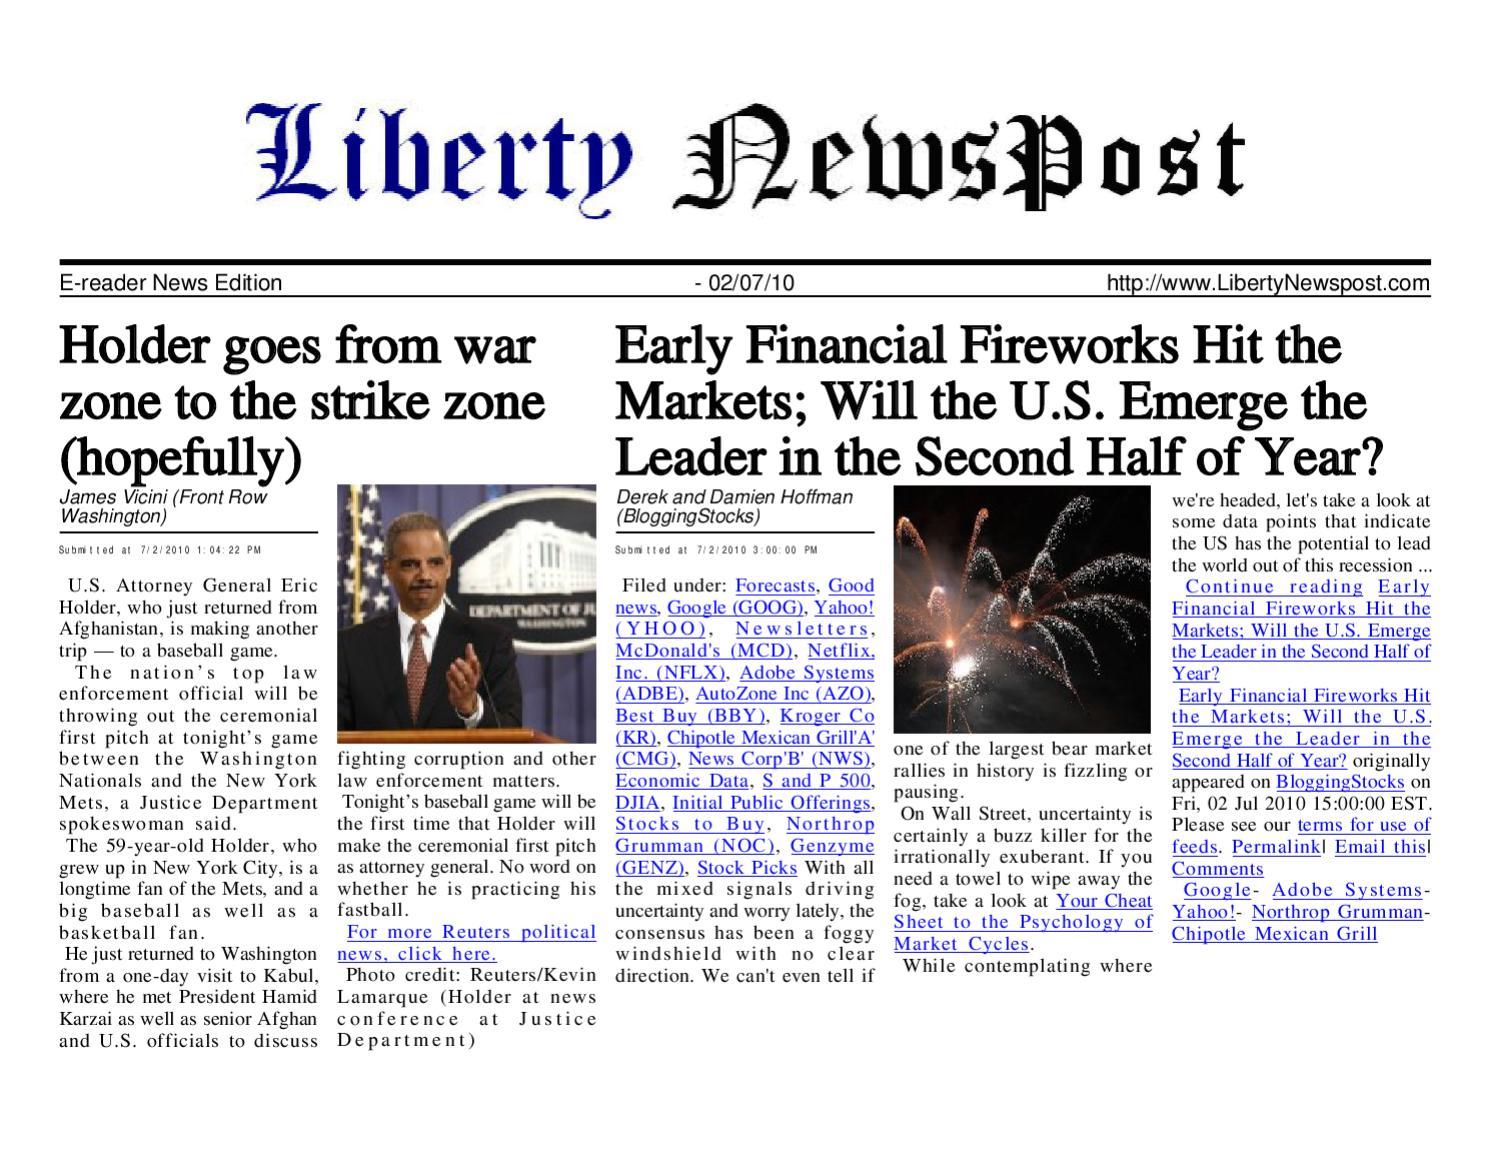 2c1712ec4ad Liberty Newspost July-02-10 by Liberty Newspost - issuu